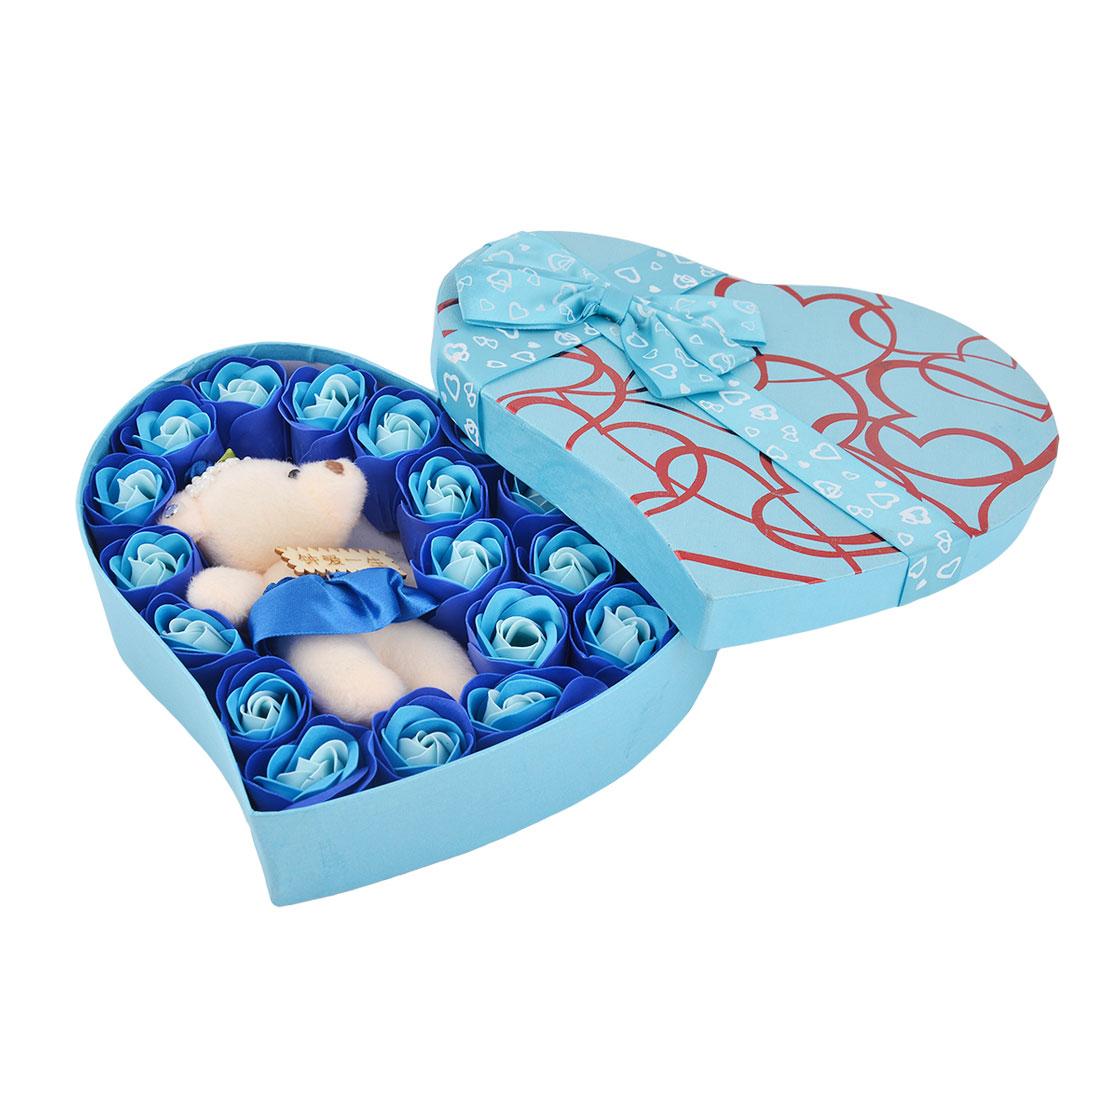 Festival Gift Heart Shaped Box Artificial Rose Flower Decor Bath Soap Petal Royal Blue 22 in 1